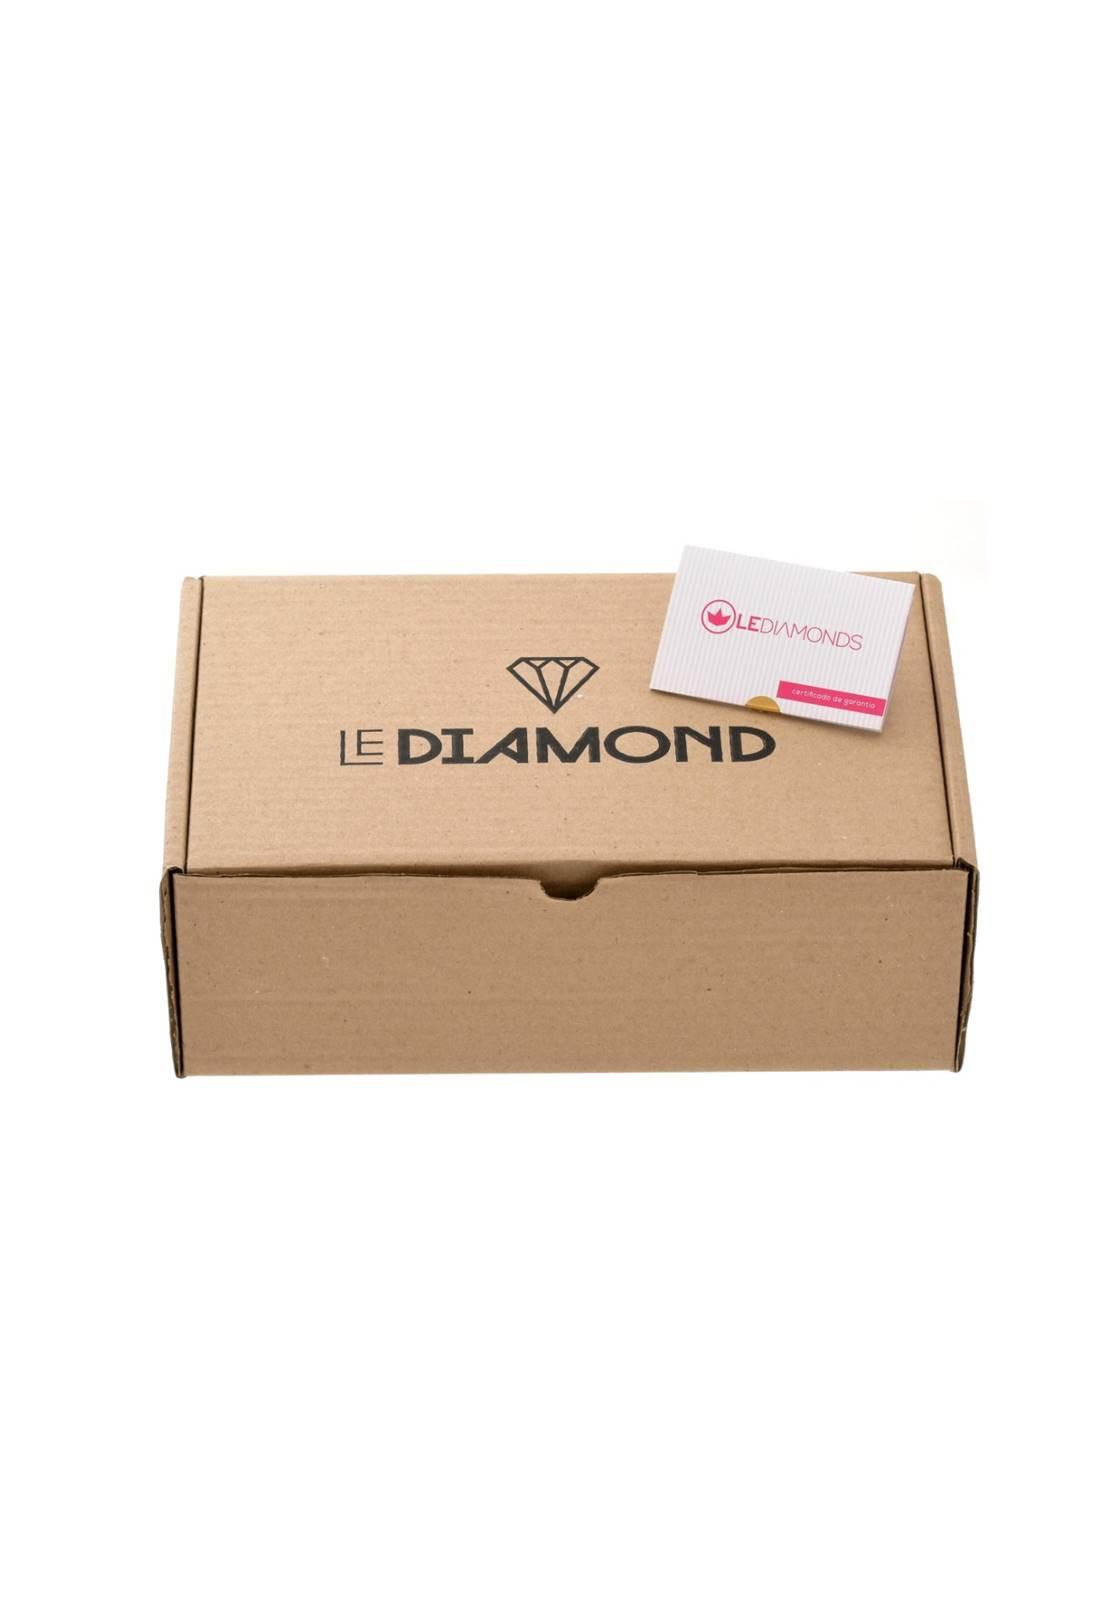 Brinco Le Diamond Ear Jacket com Zircônias Prata